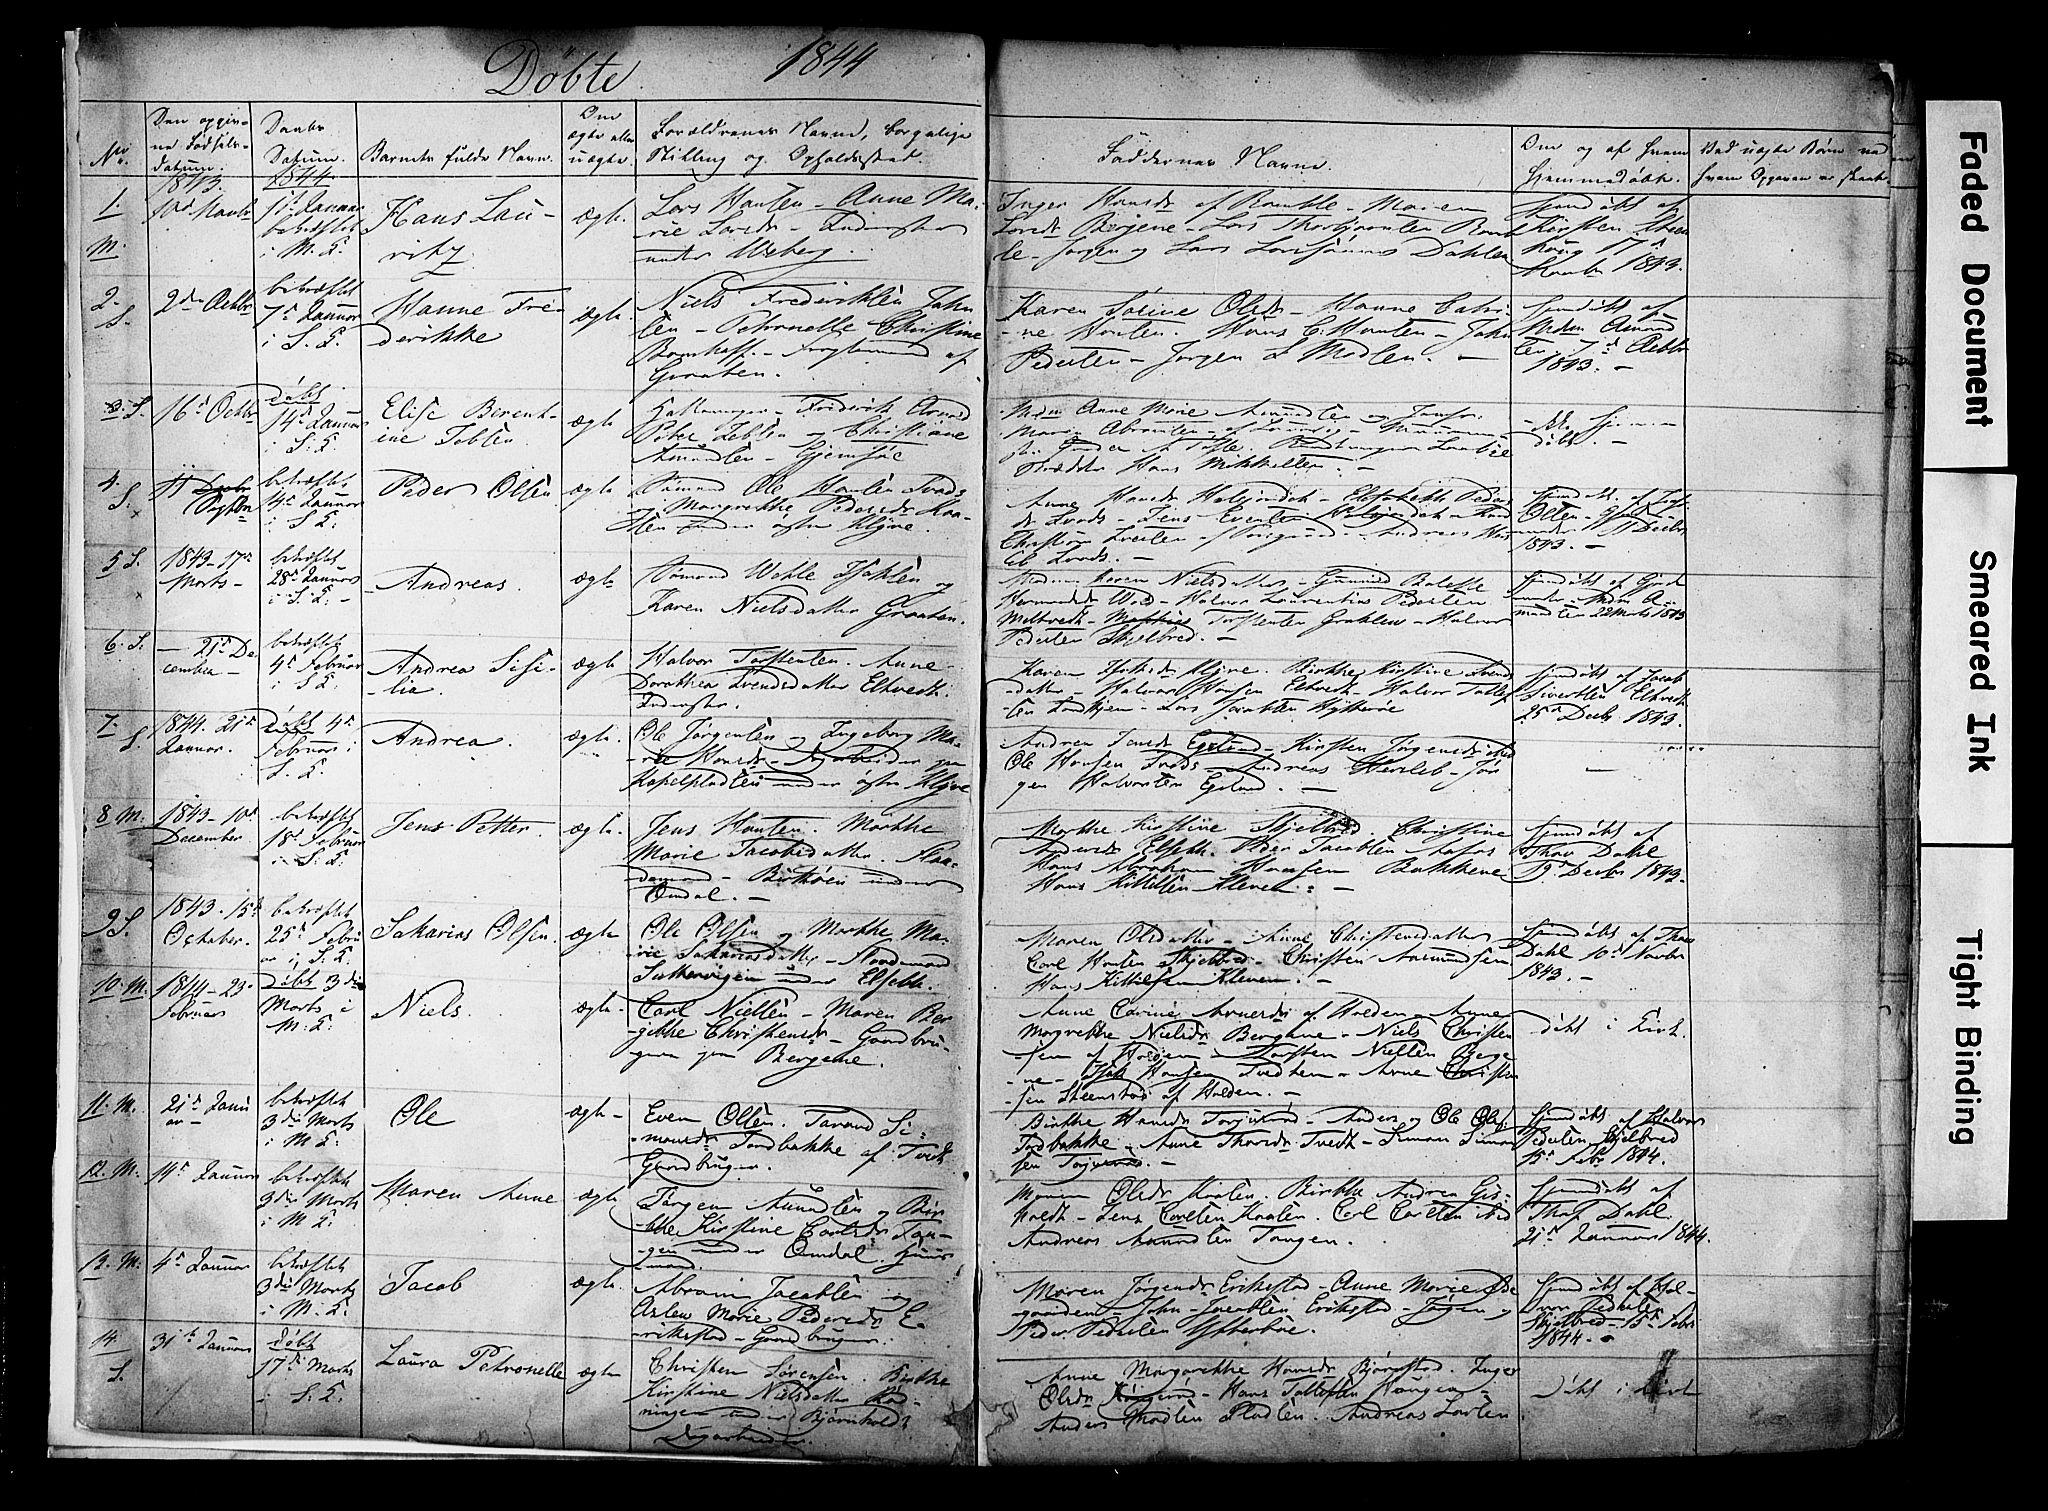 SAKO, Solum kirkebøker, F/Fa/L0006: Ministerialbok nr. I 6, 1844-1855, s. 2